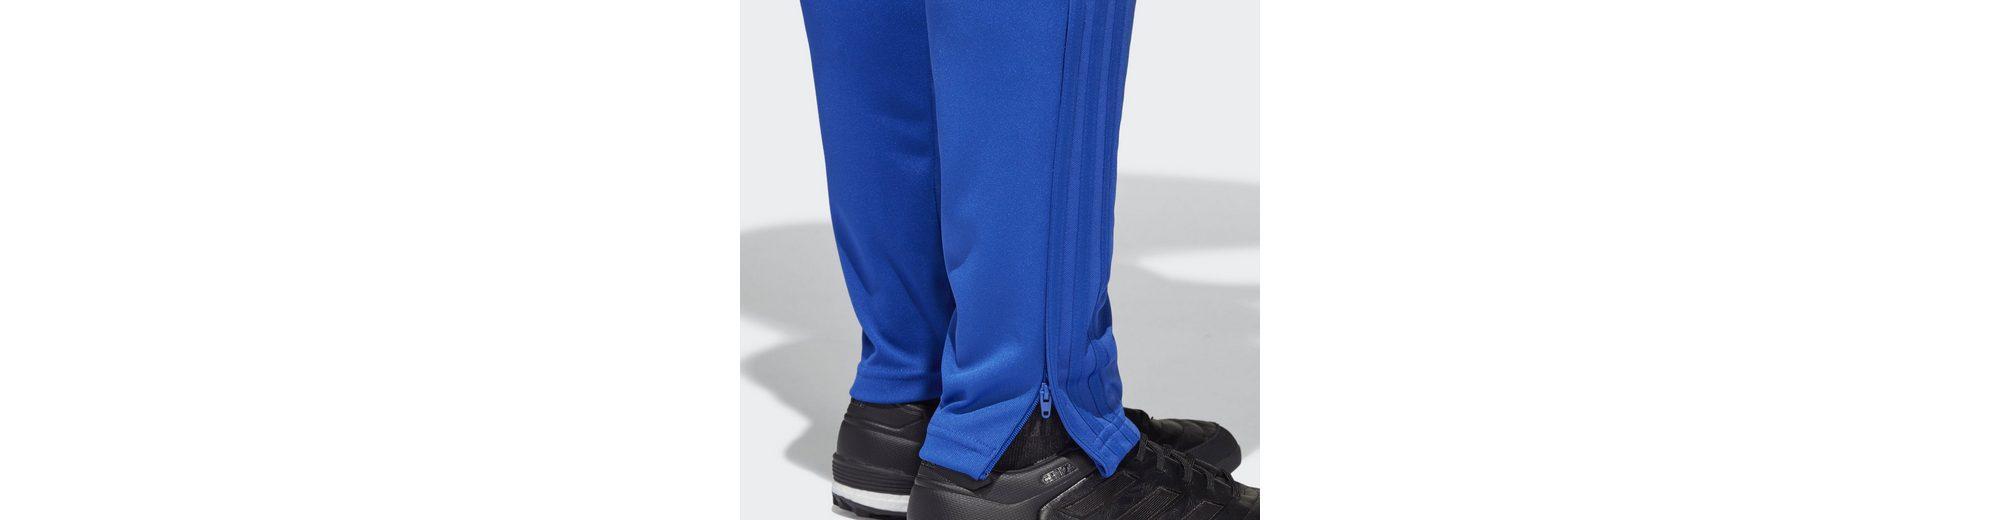 Versand Rabatt Verkauf Unter Online-Verkauf adidas Performance Trainingshose Condivo 18 Trainingshose Niedrige Versandgebühr Online JEYvnd